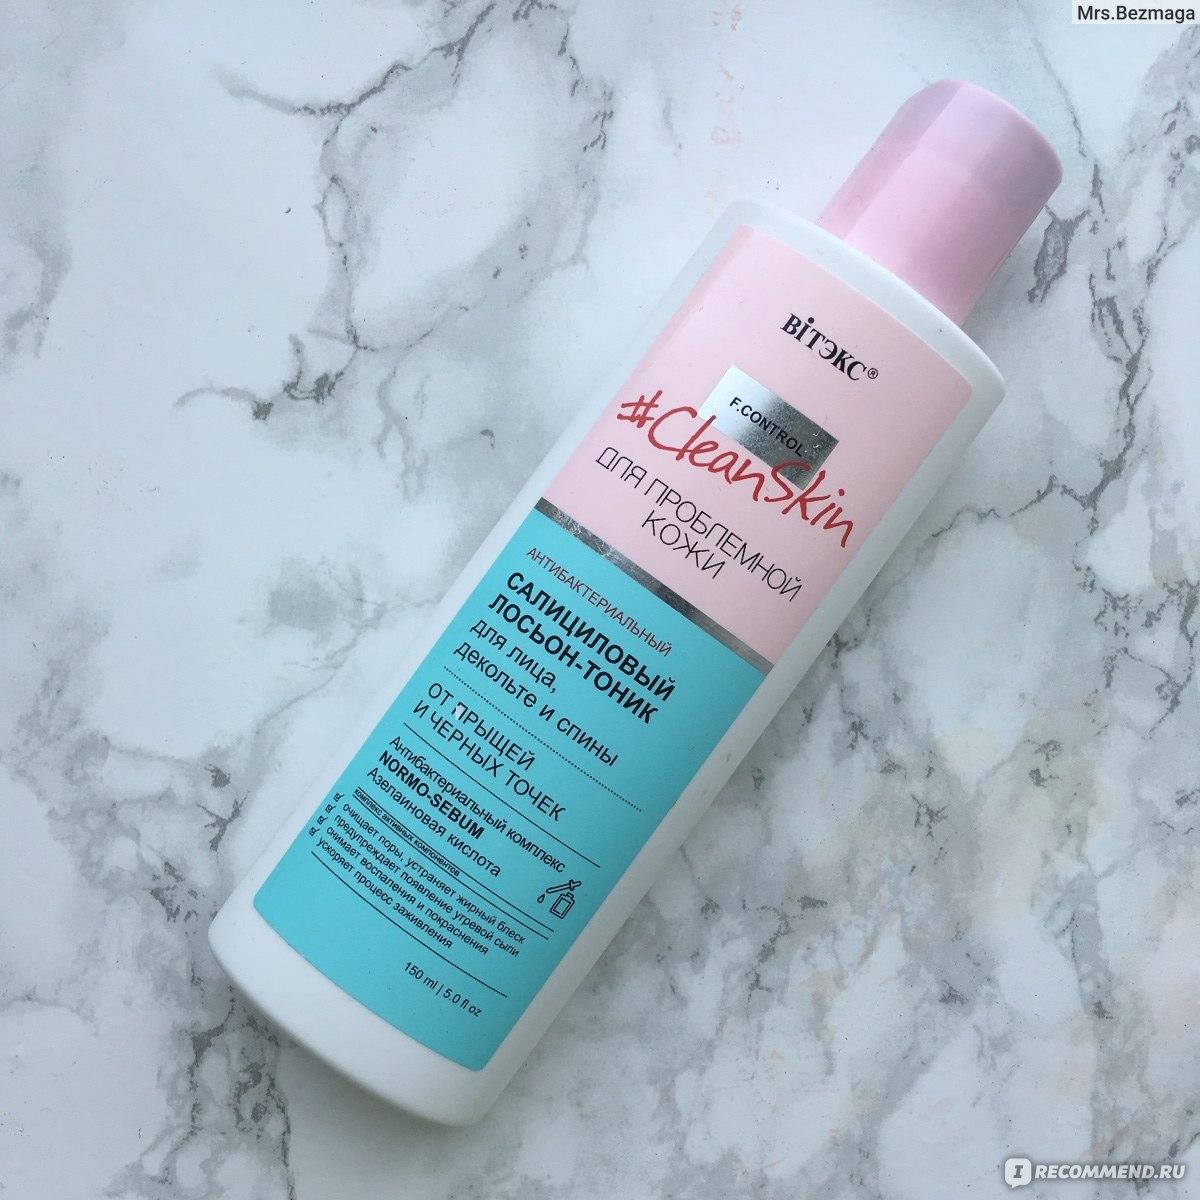 Лосьон-тоник Белита-Витэкс CleanSkin для проблемной кожи